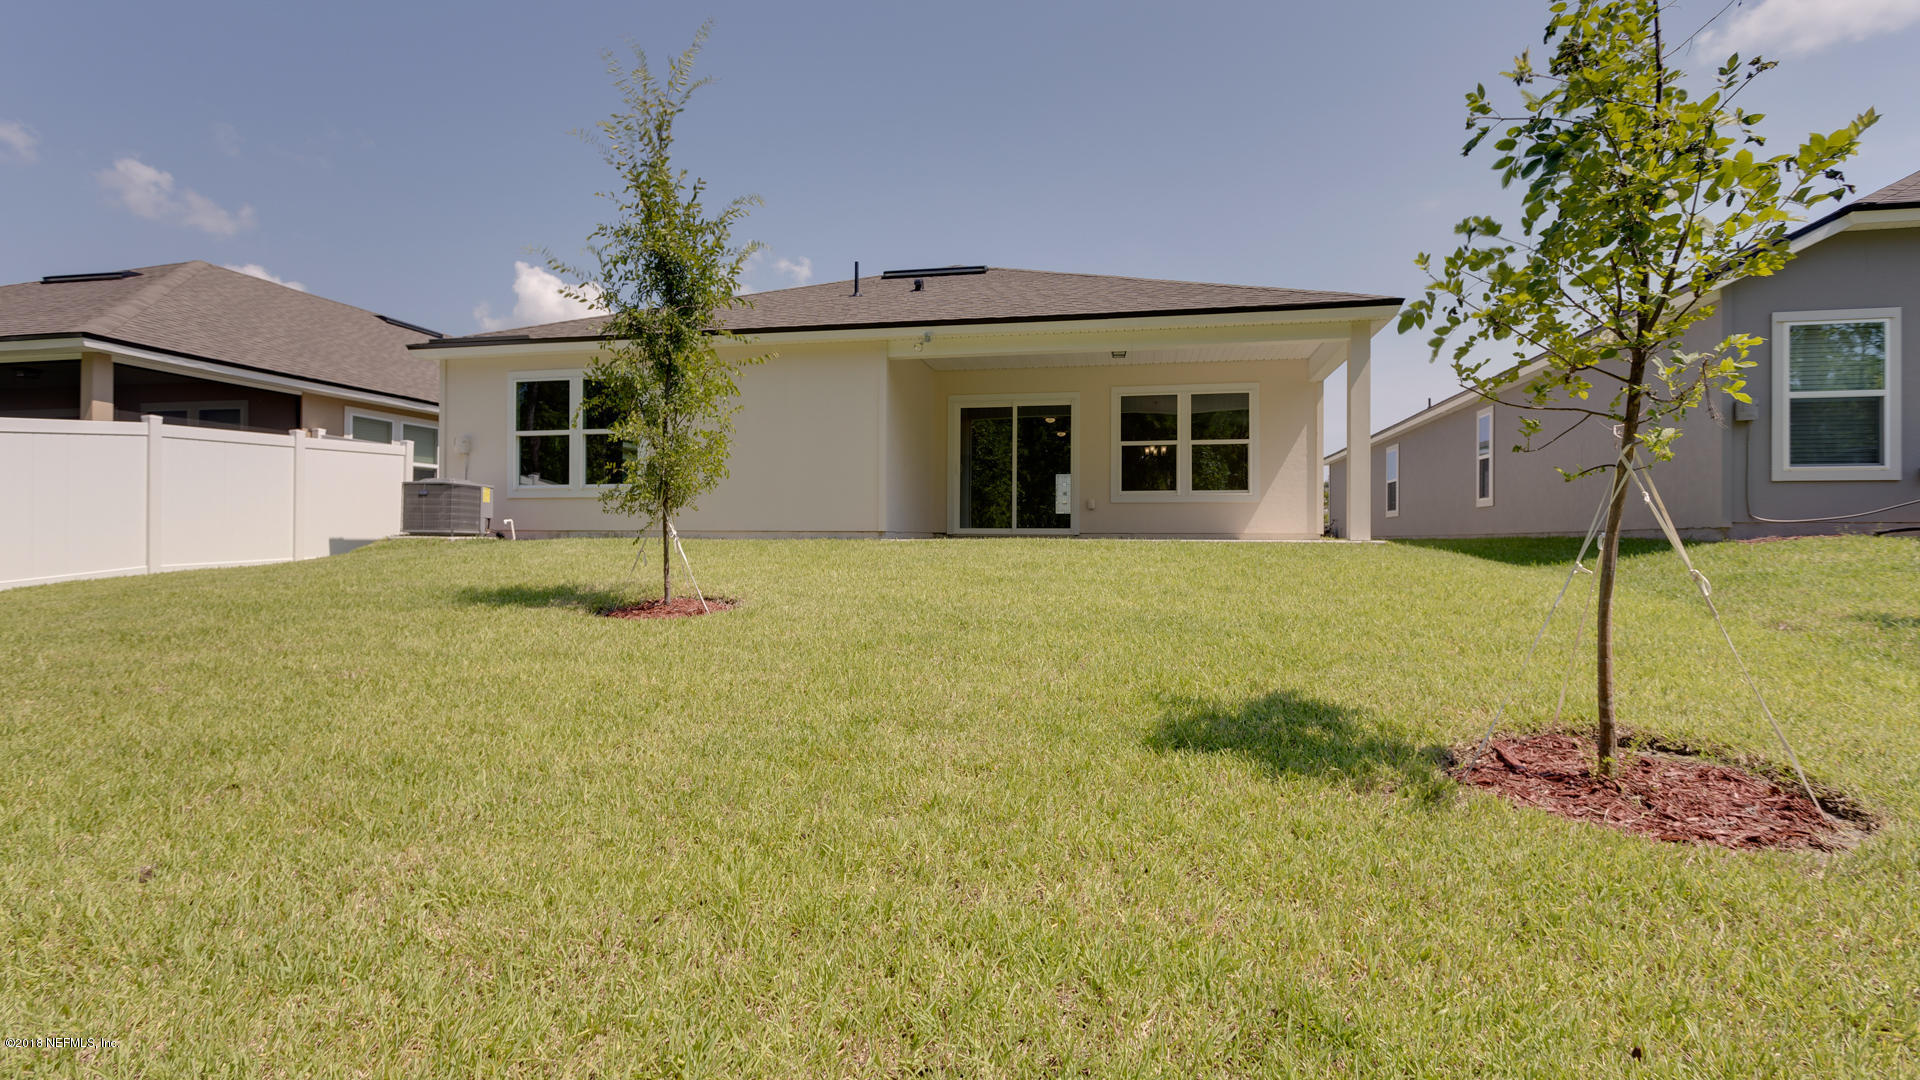 4125 FISHING CREEK, MIDDLEBURG, FLORIDA 32068, 3 Bedrooms Bedrooms, ,2 BathroomsBathrooms,Residential - single family,For sale,FISHING CREEK,911823